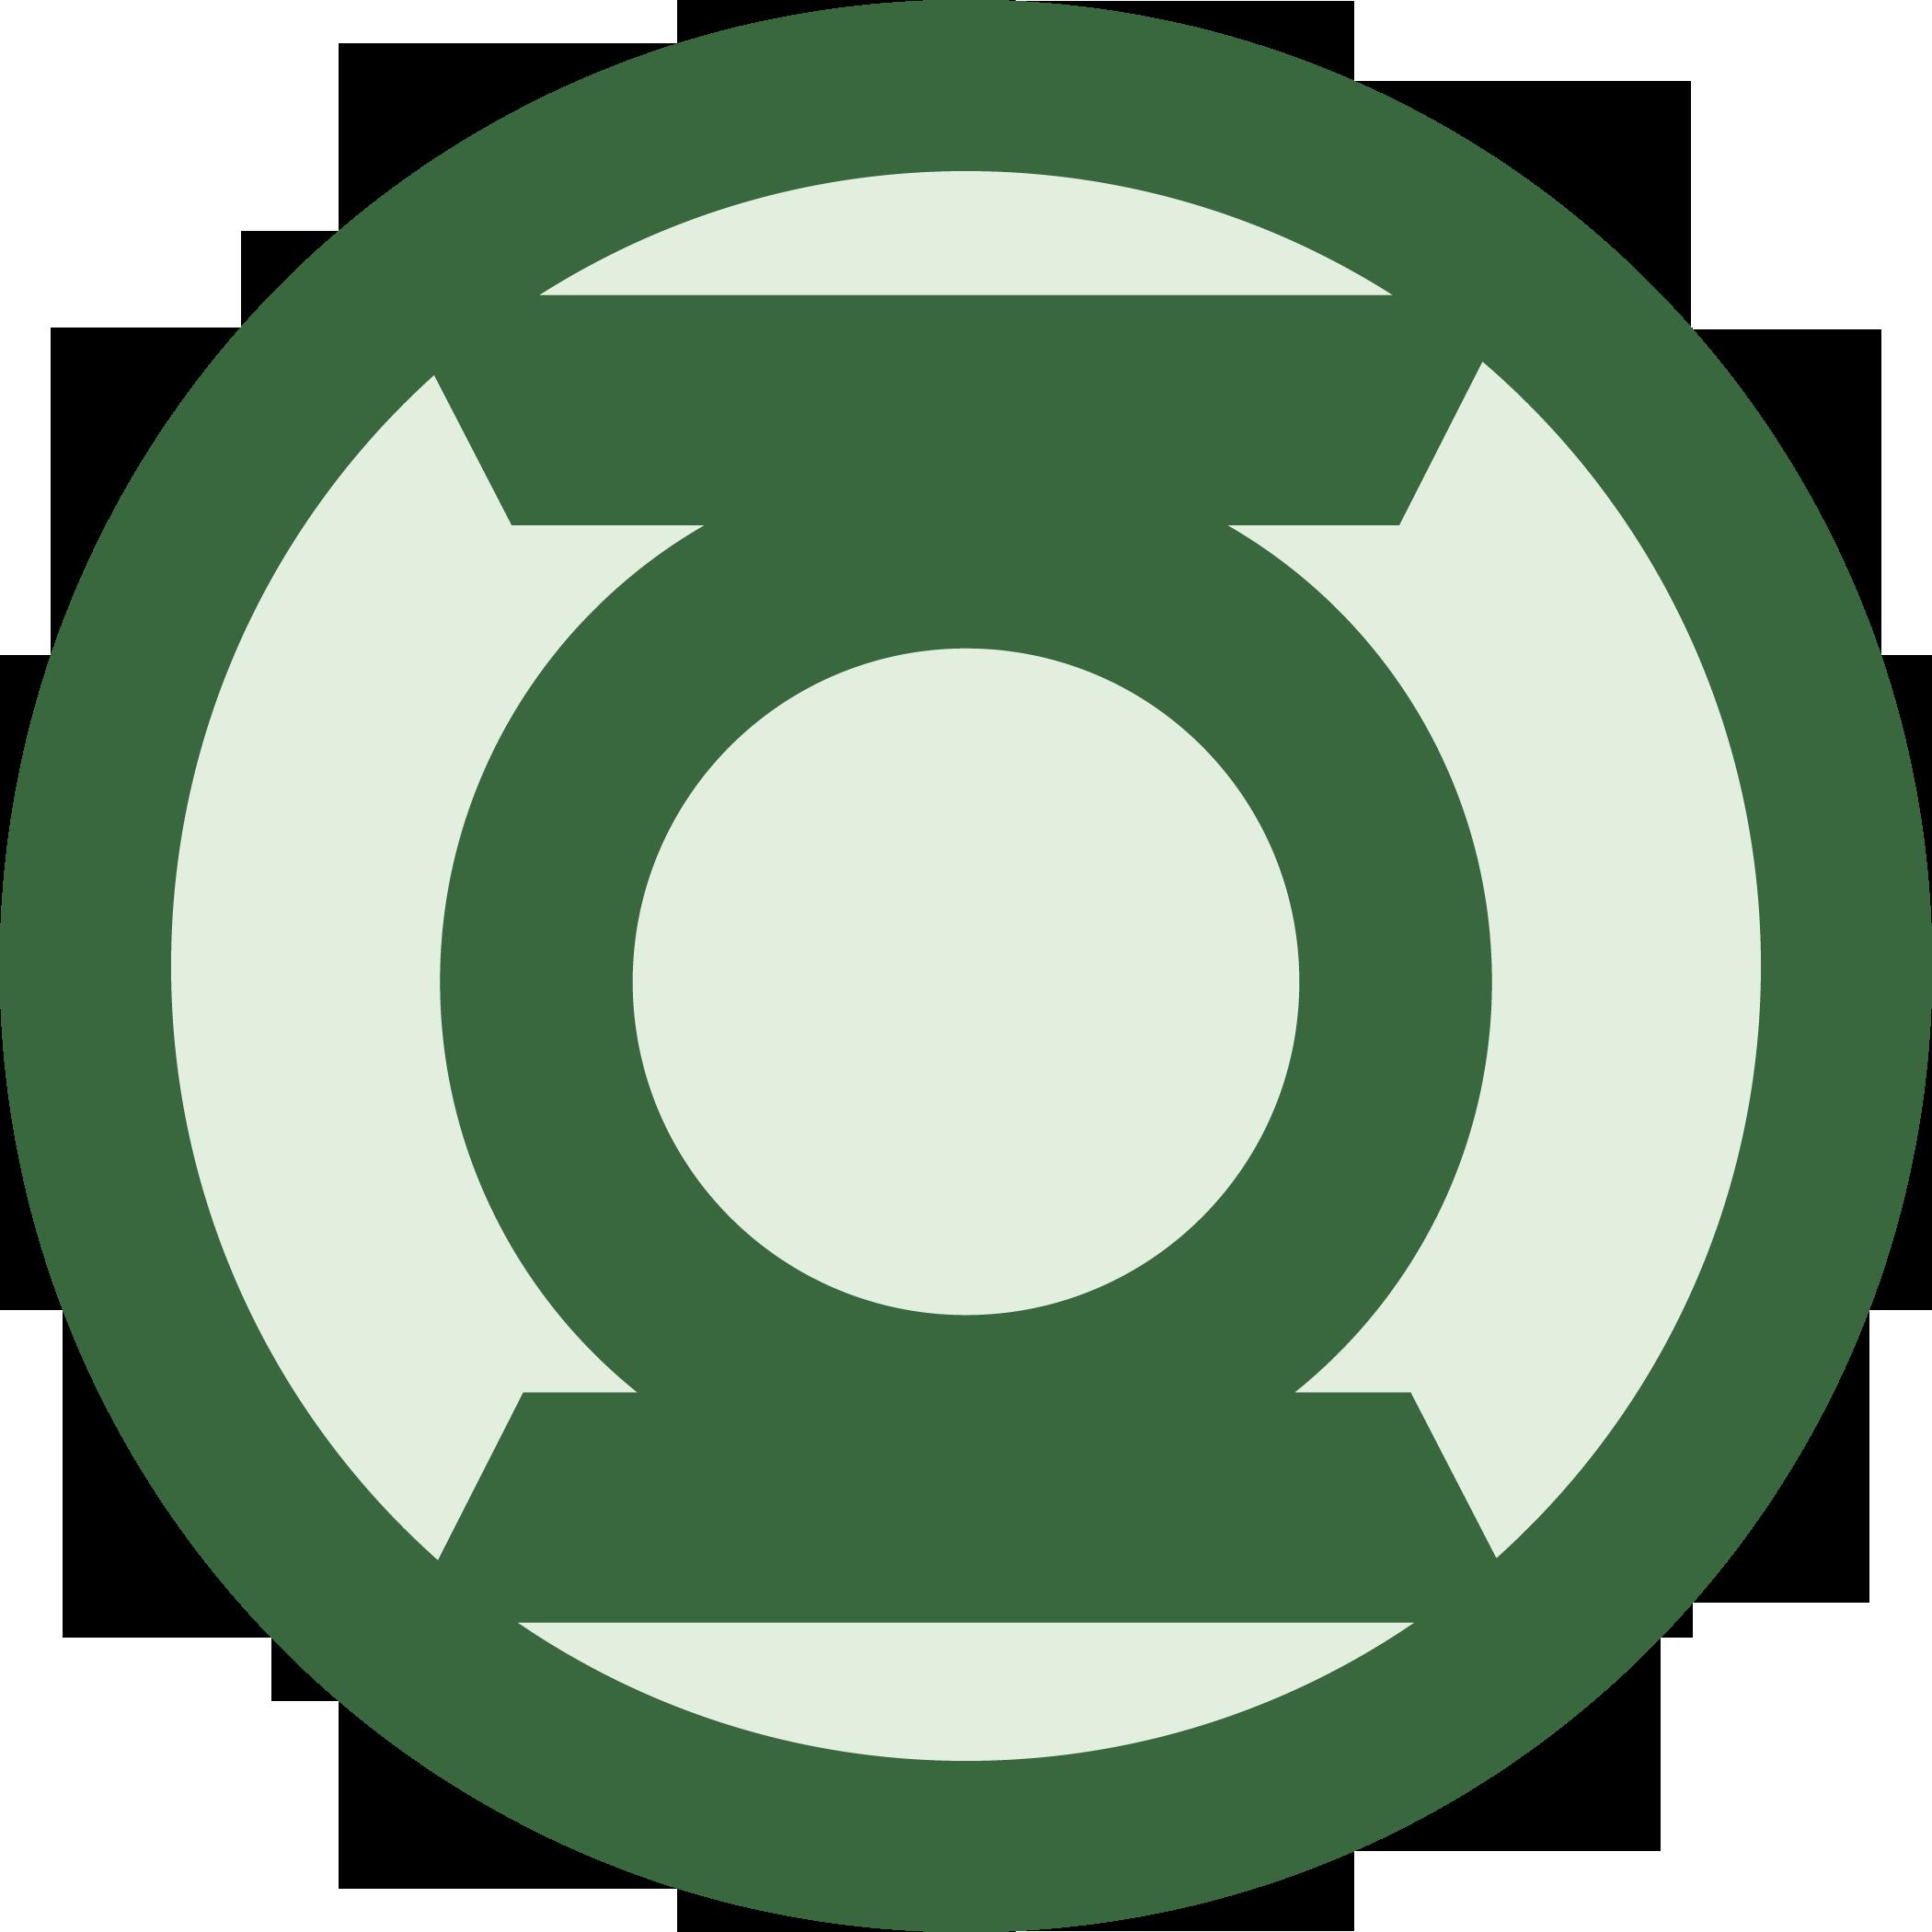 Télécharger photo green lantern logo png